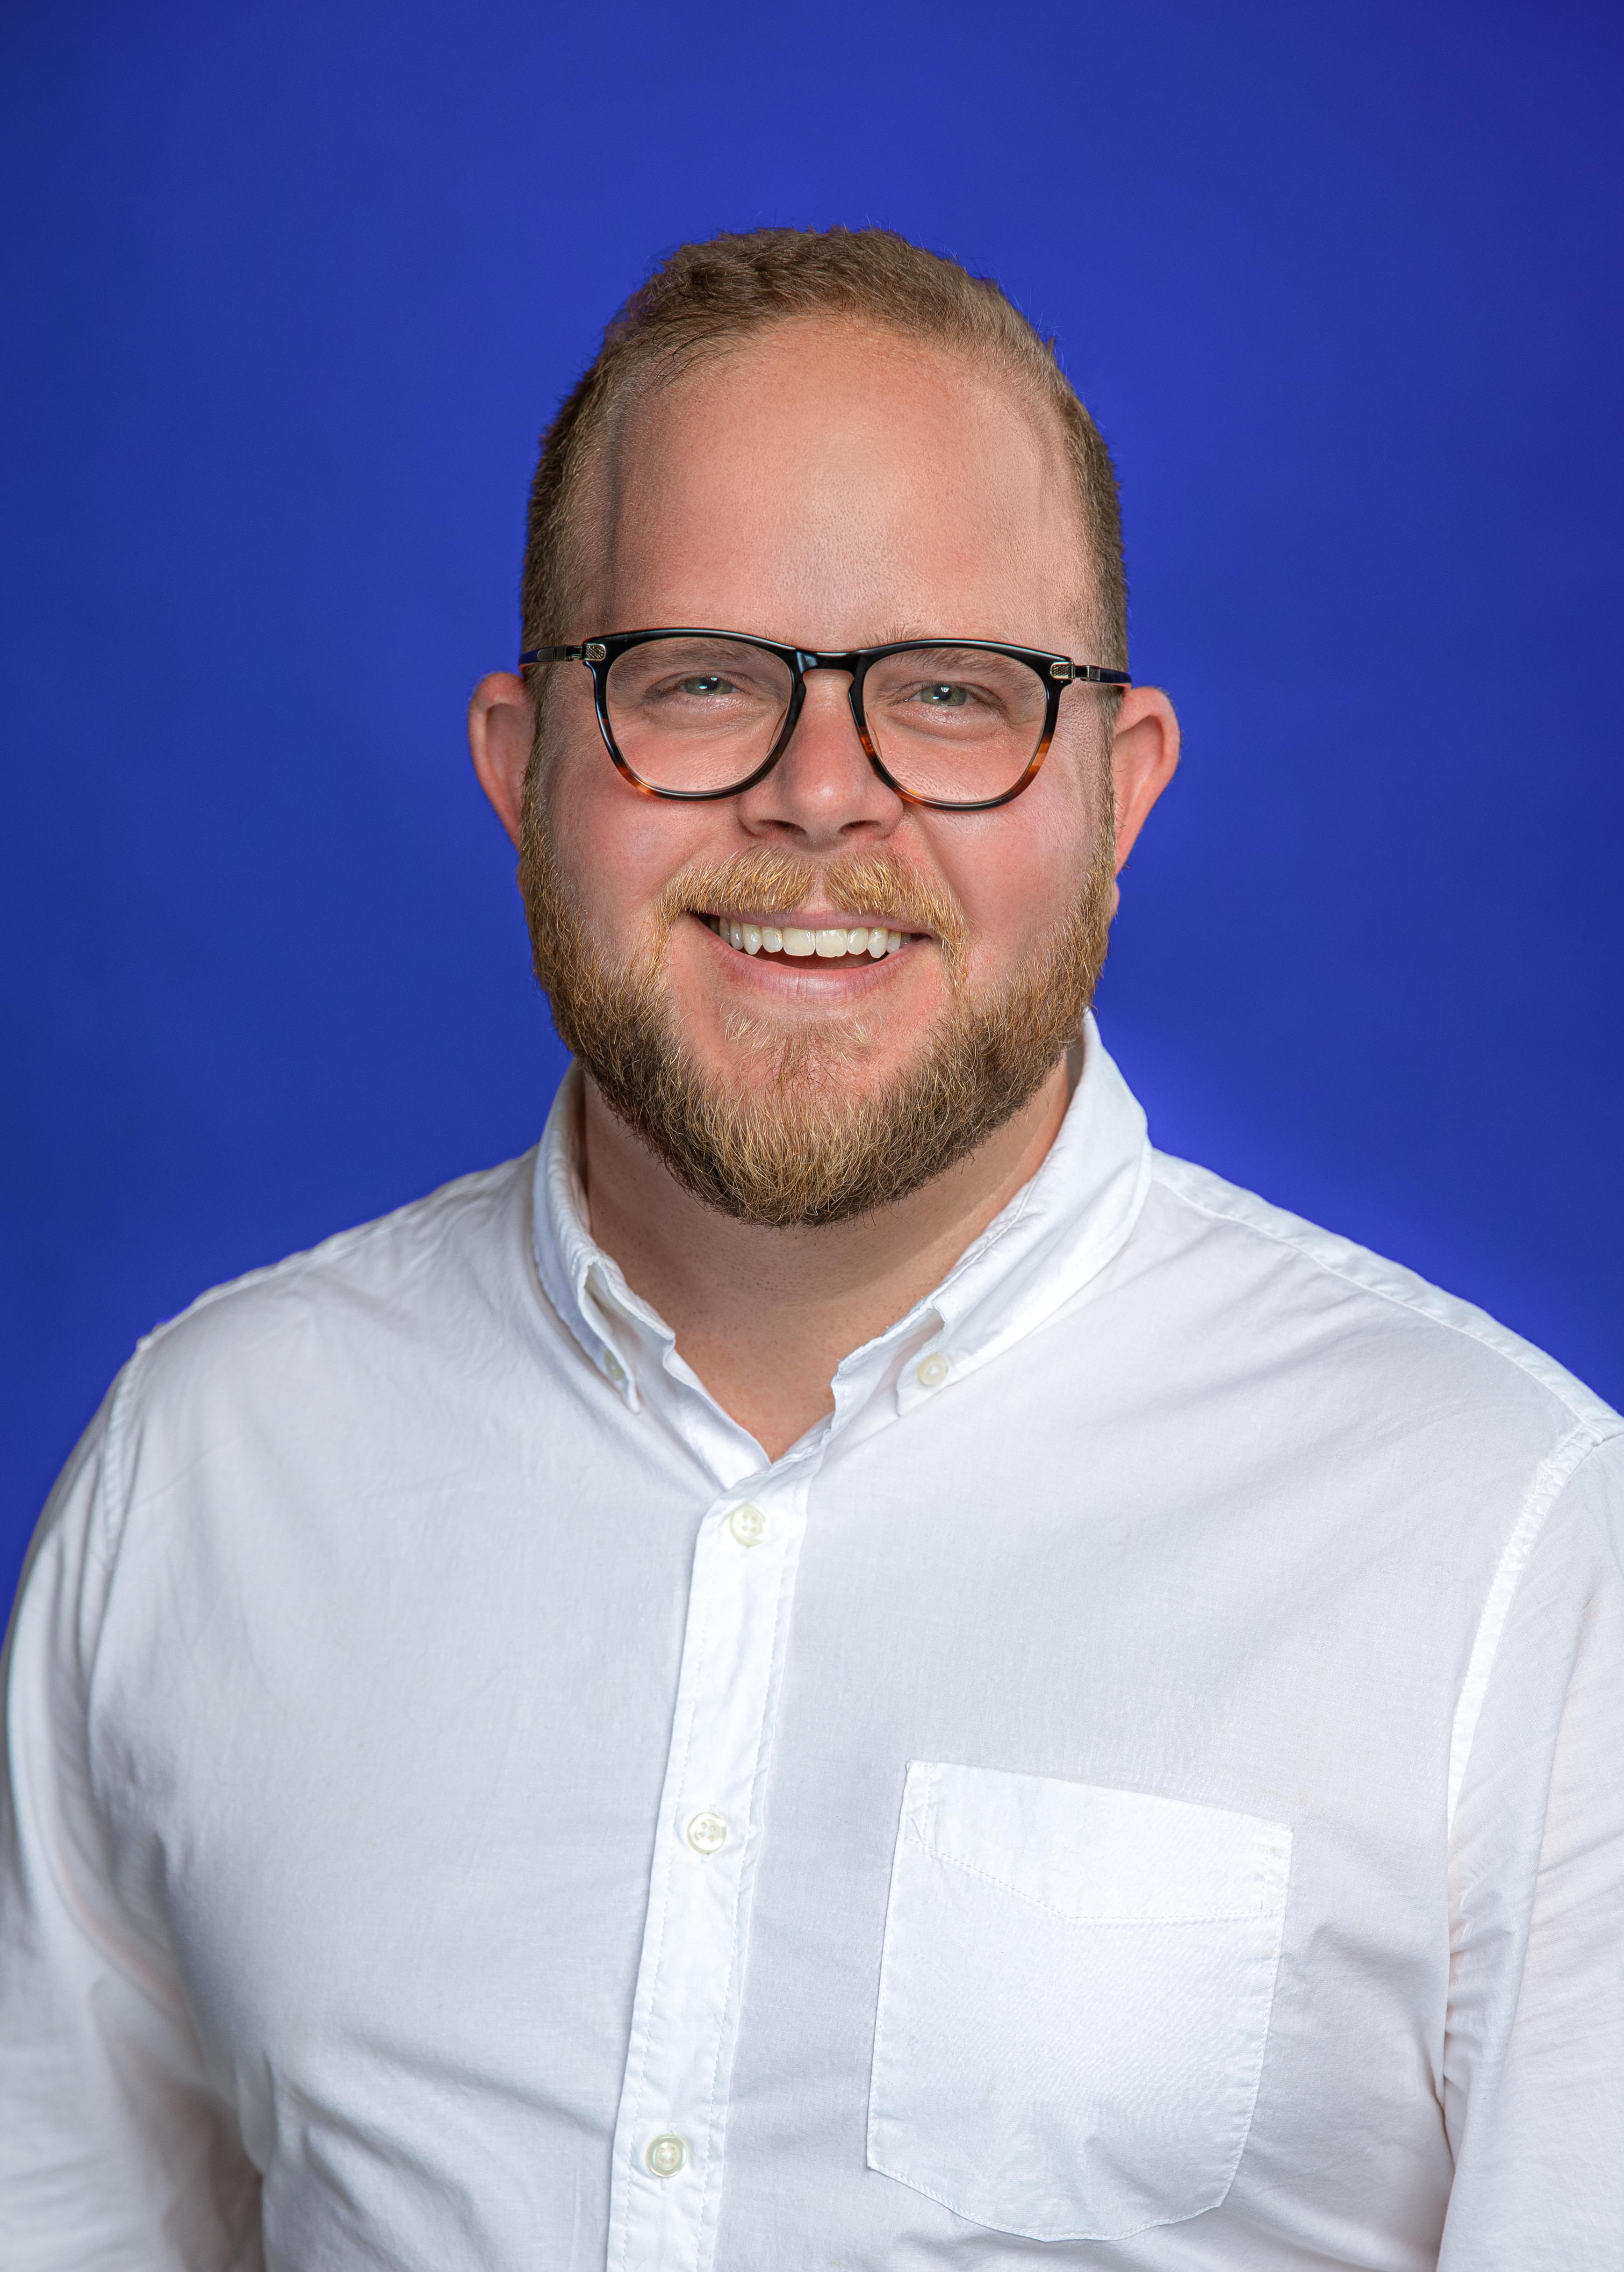 Aaron Bölzle